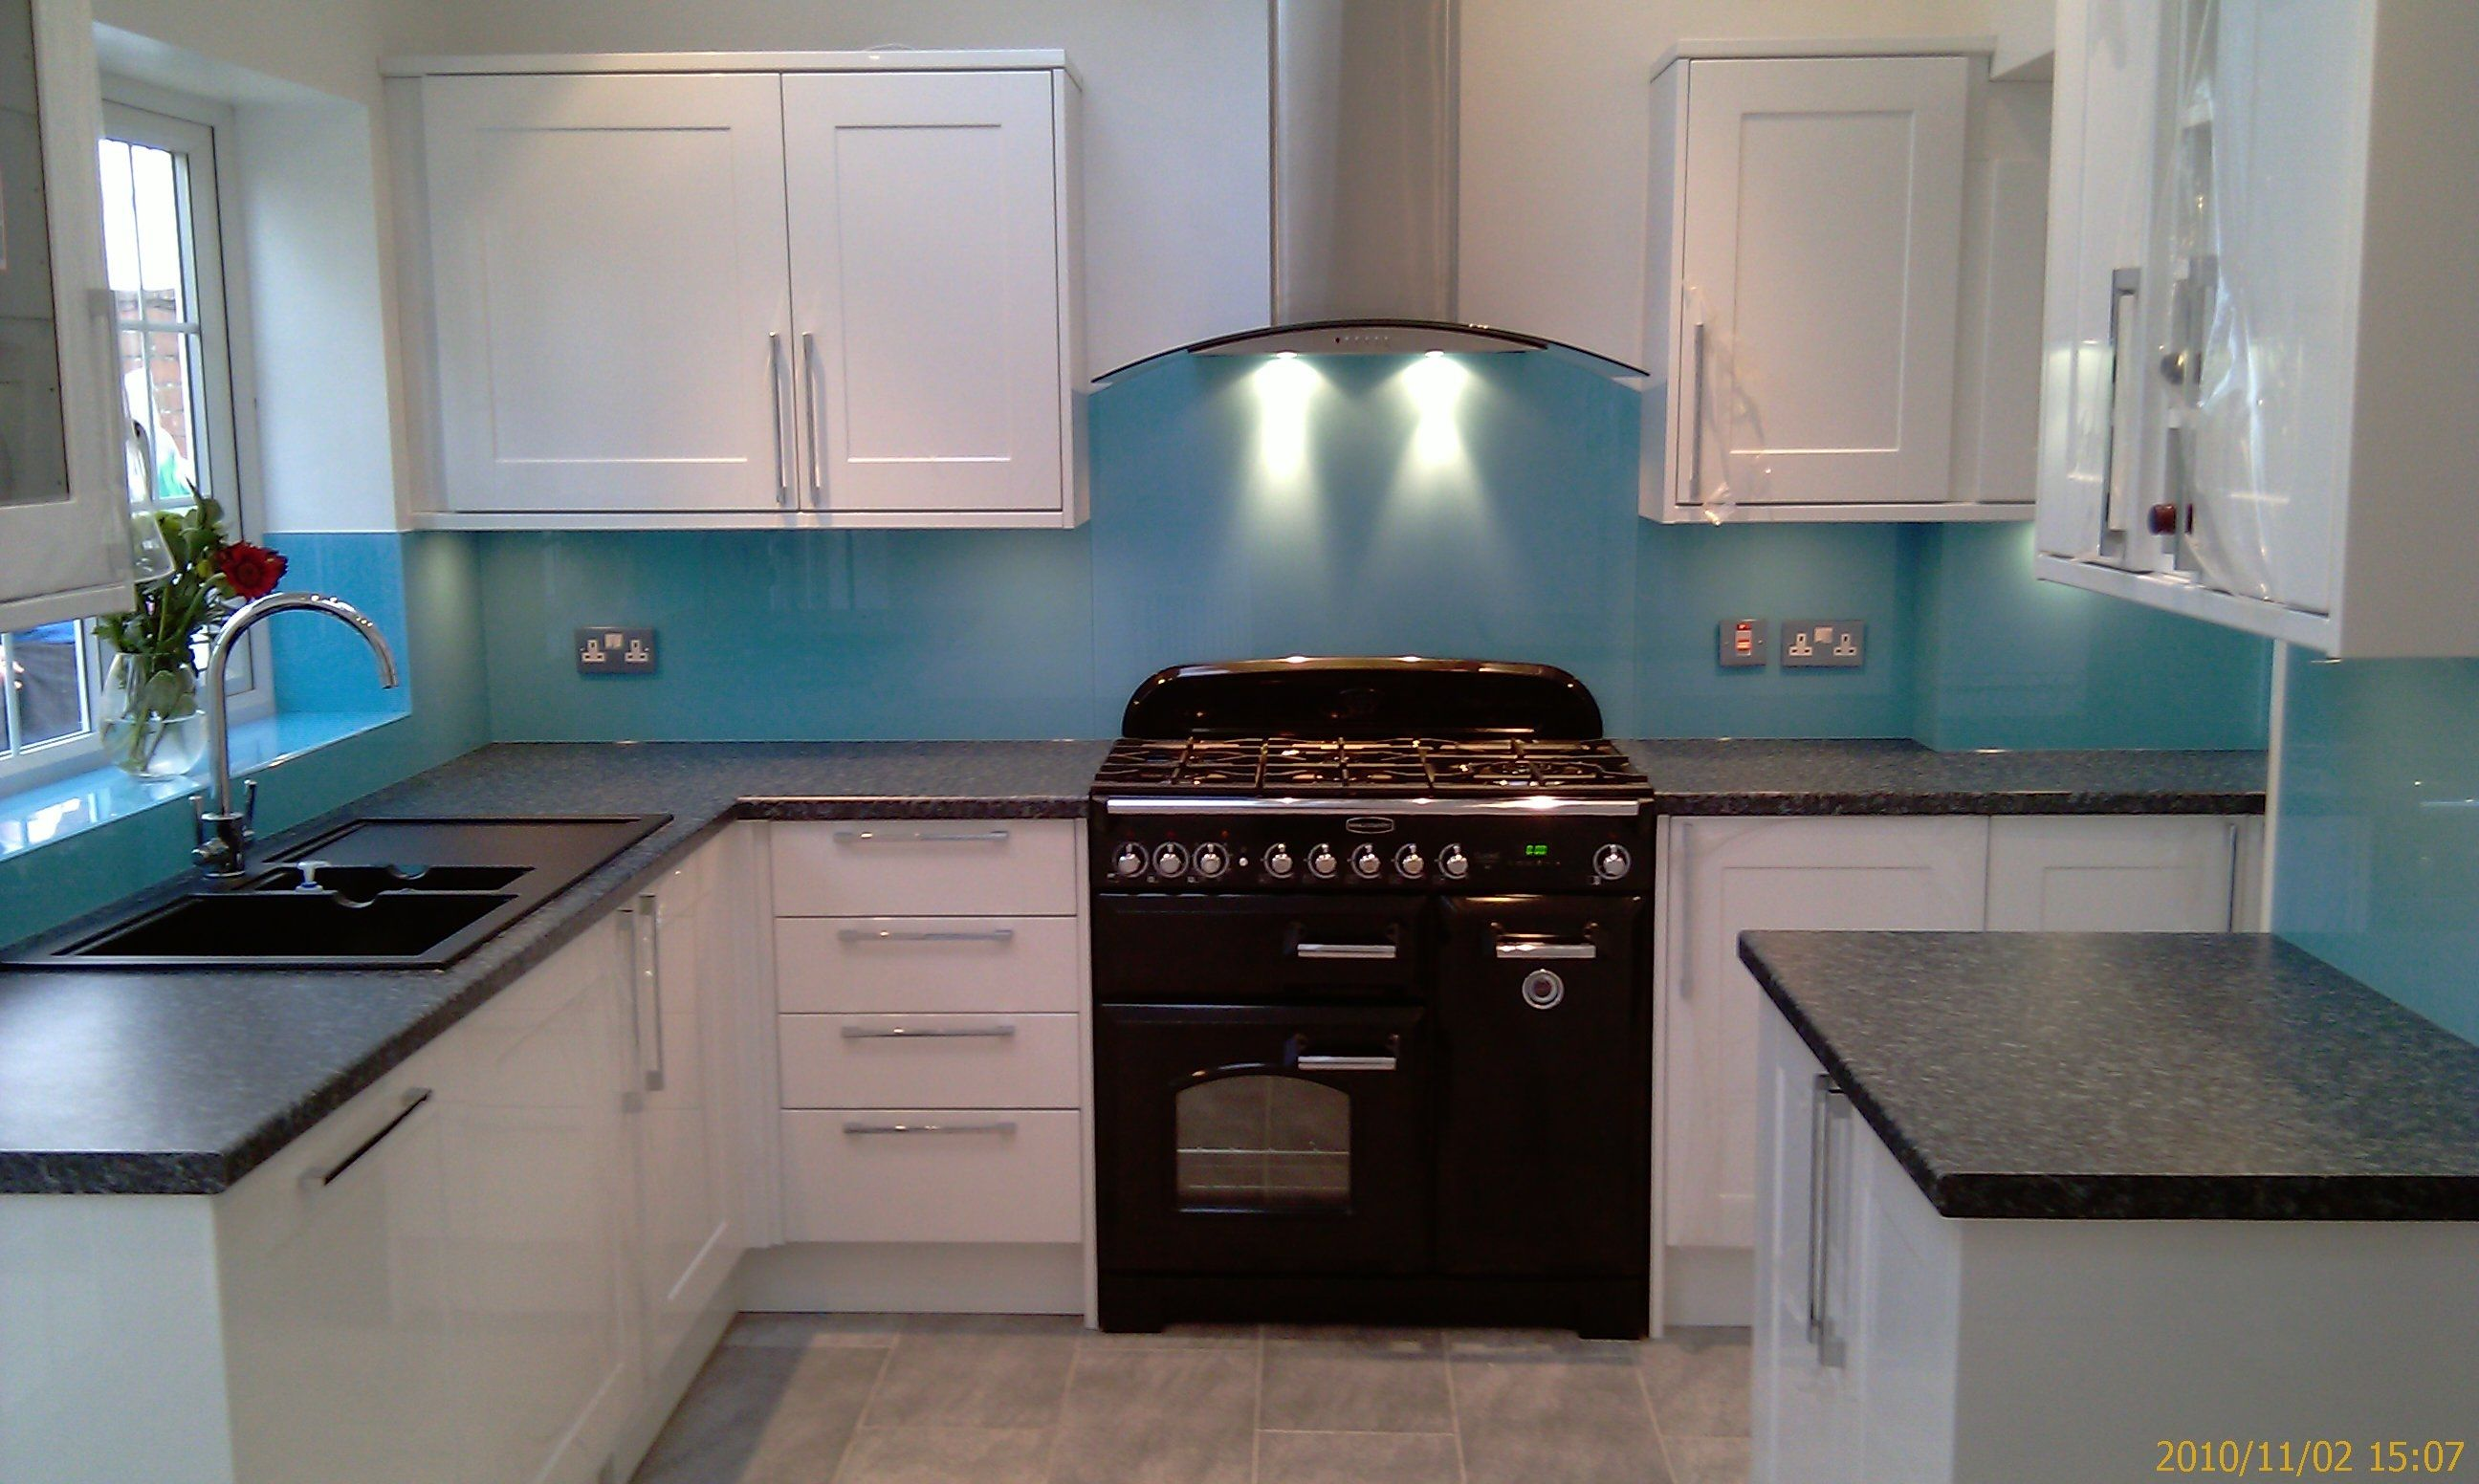 Splash Blue Coloured Glass Splashback In A White Kitchen With Curved Extractor Visit Easyglasssplashbacks